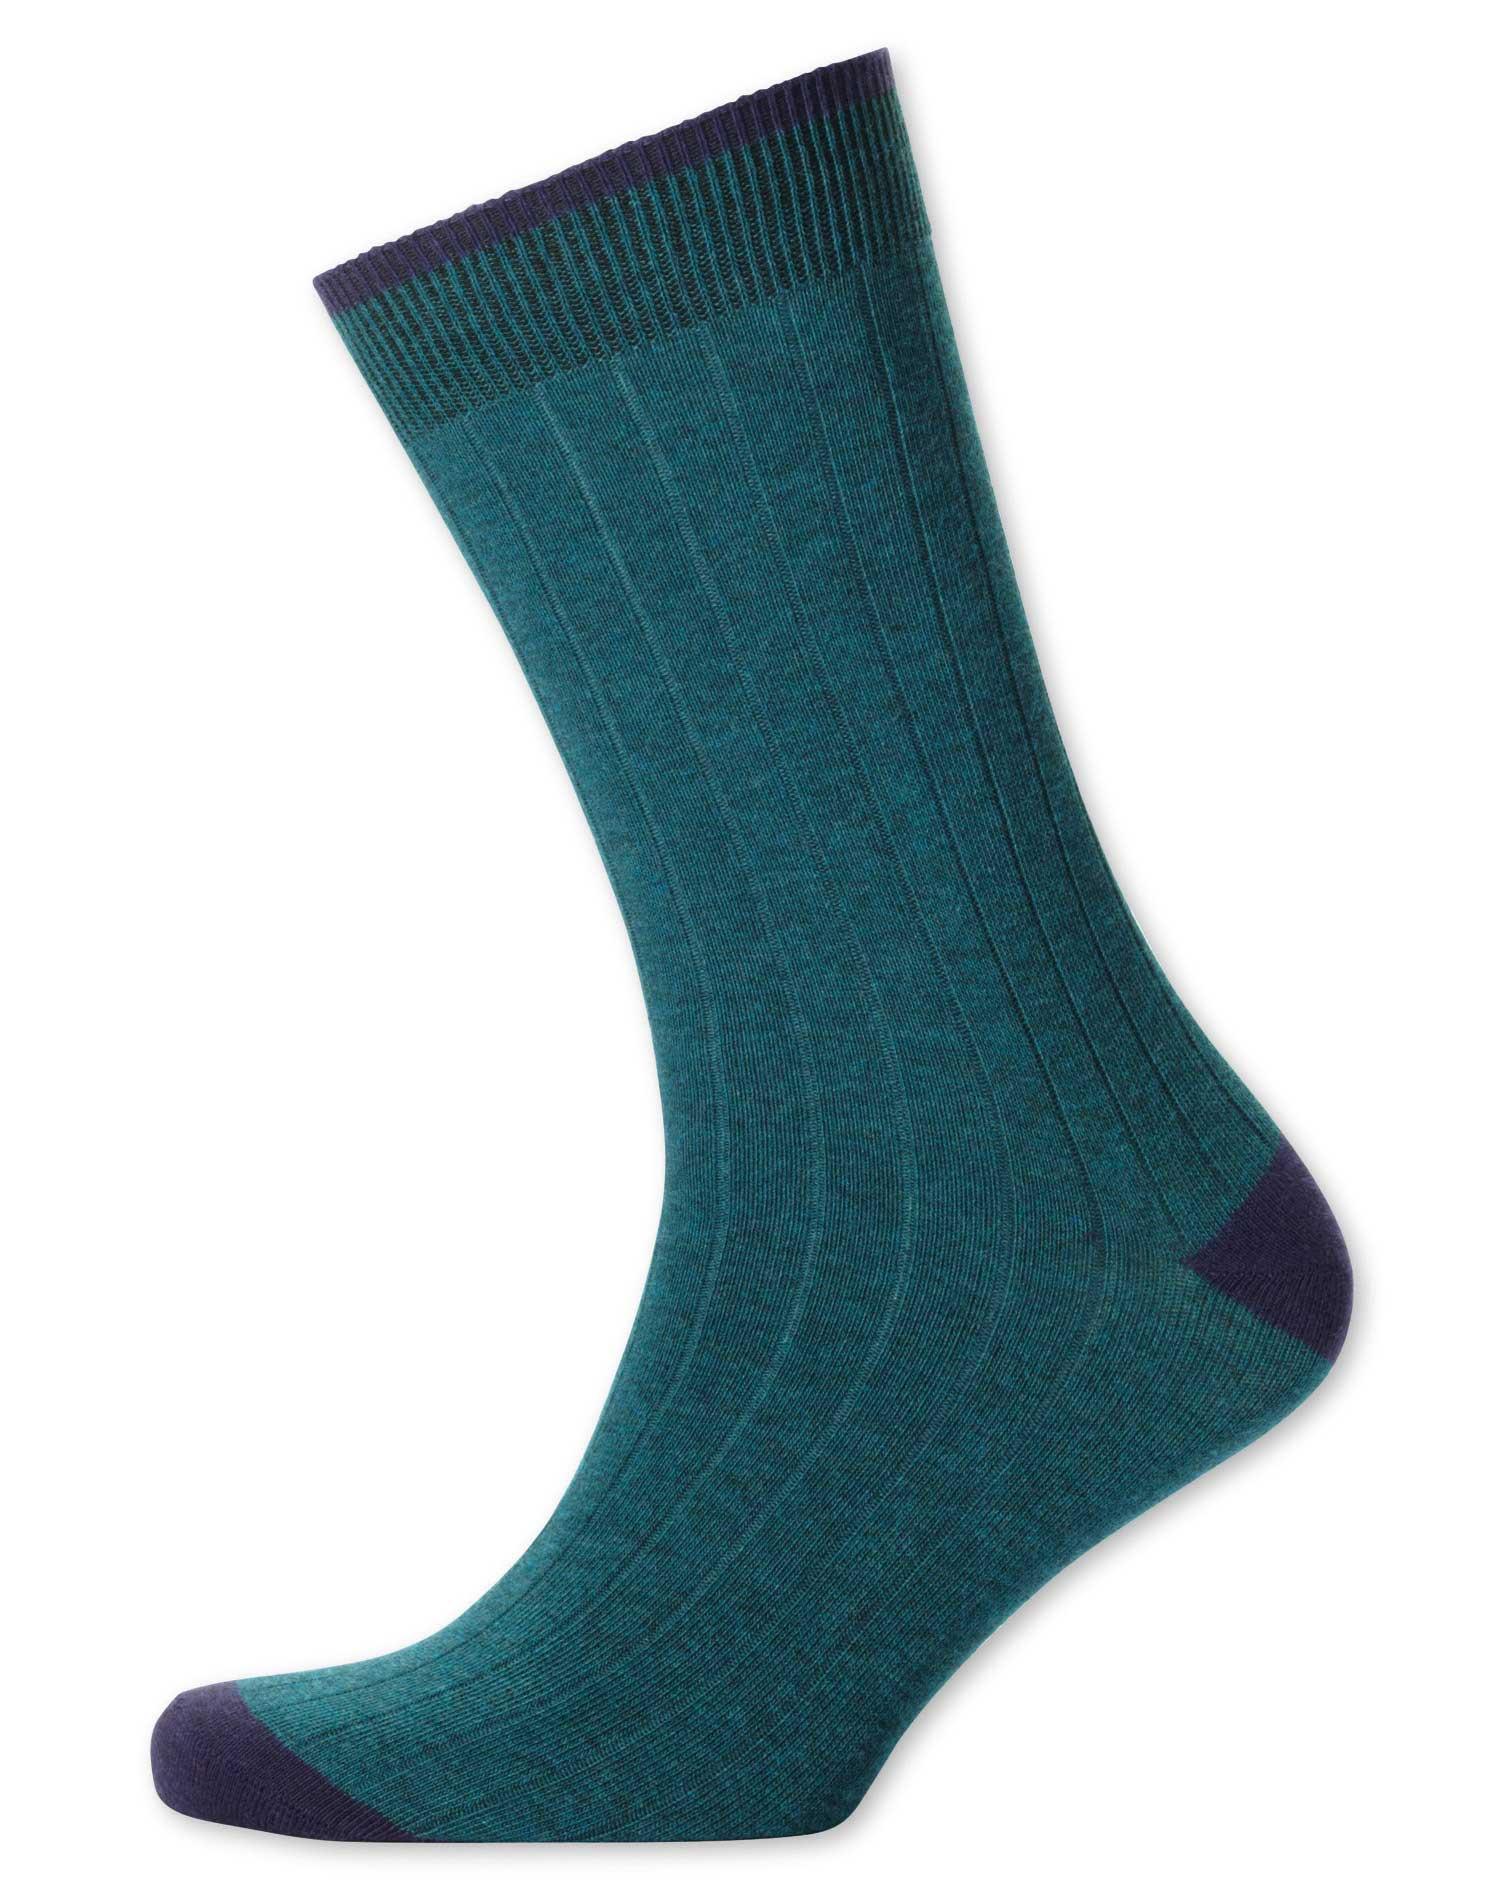 Teal Ribbed Socks Size Medium by Charles Tyrwhitt